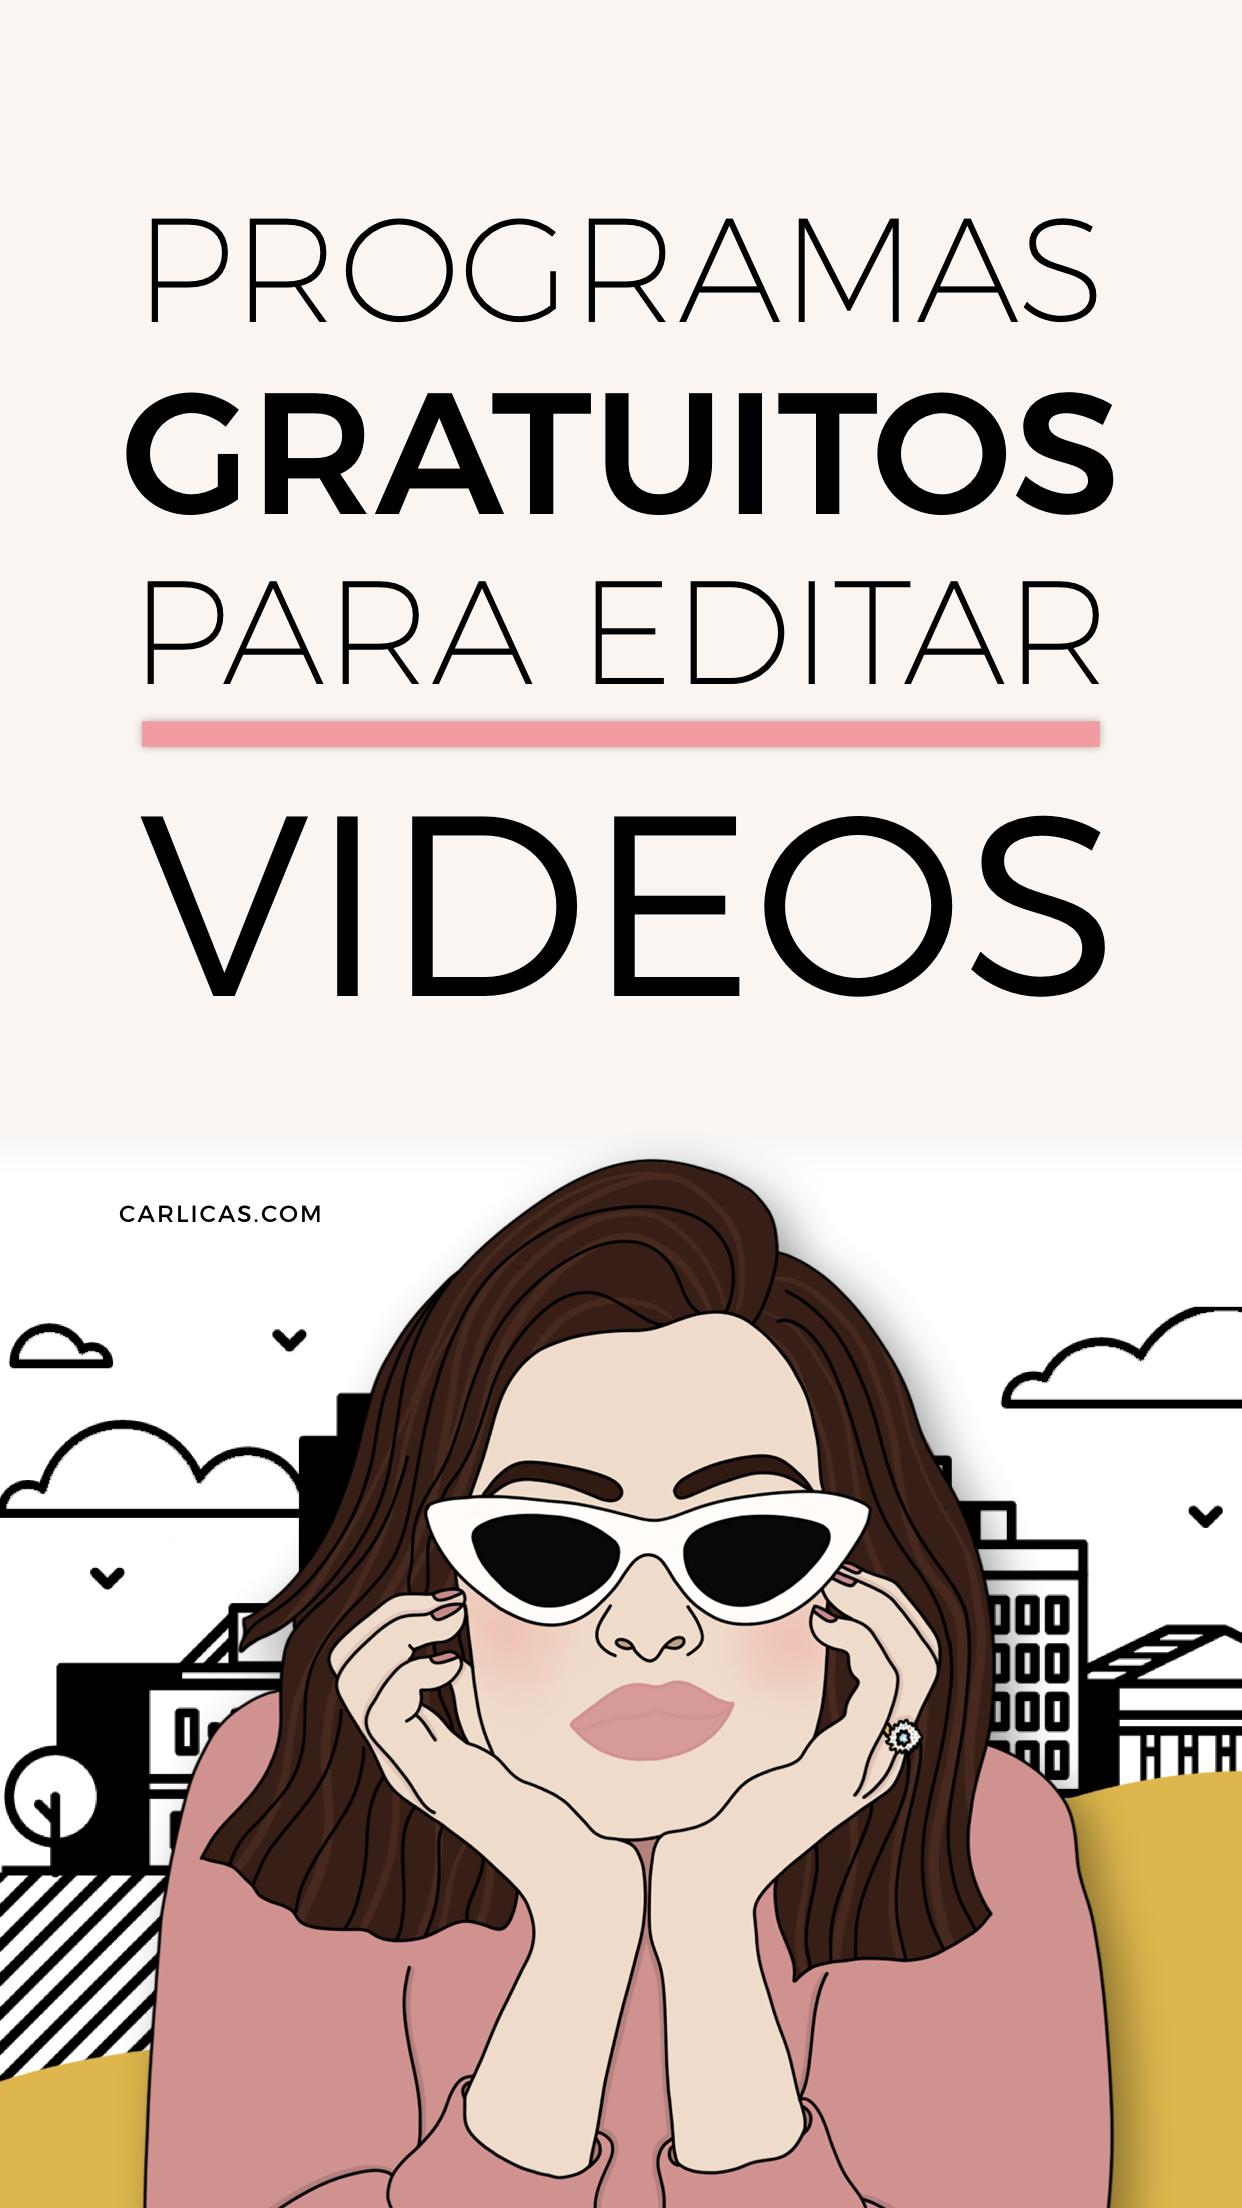 Top 10 Programas Para Editar Videos Listado 2020 Videos De Youtube Ideas Para Vídeos De Youtube Consejos Para Redes Sociales